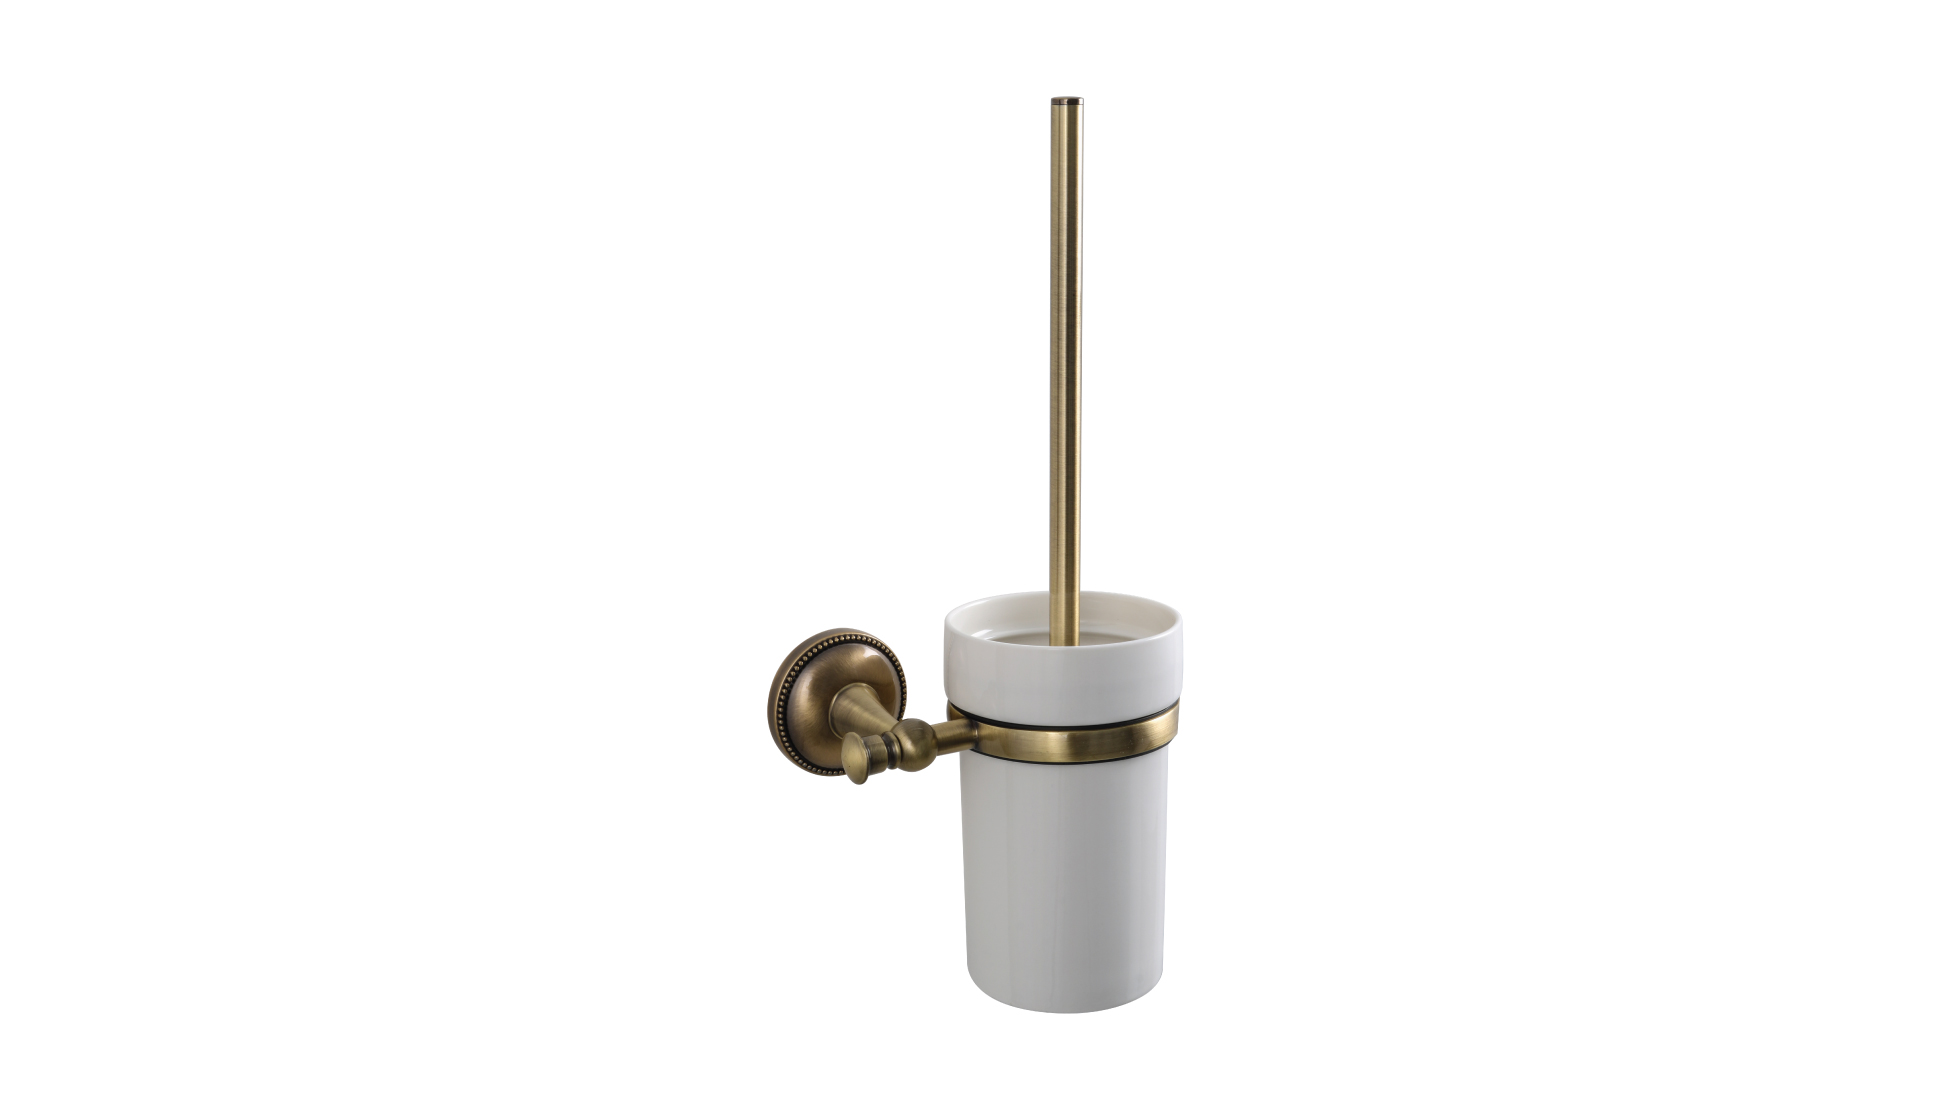 Ерш для туалета Alfa GR-9513